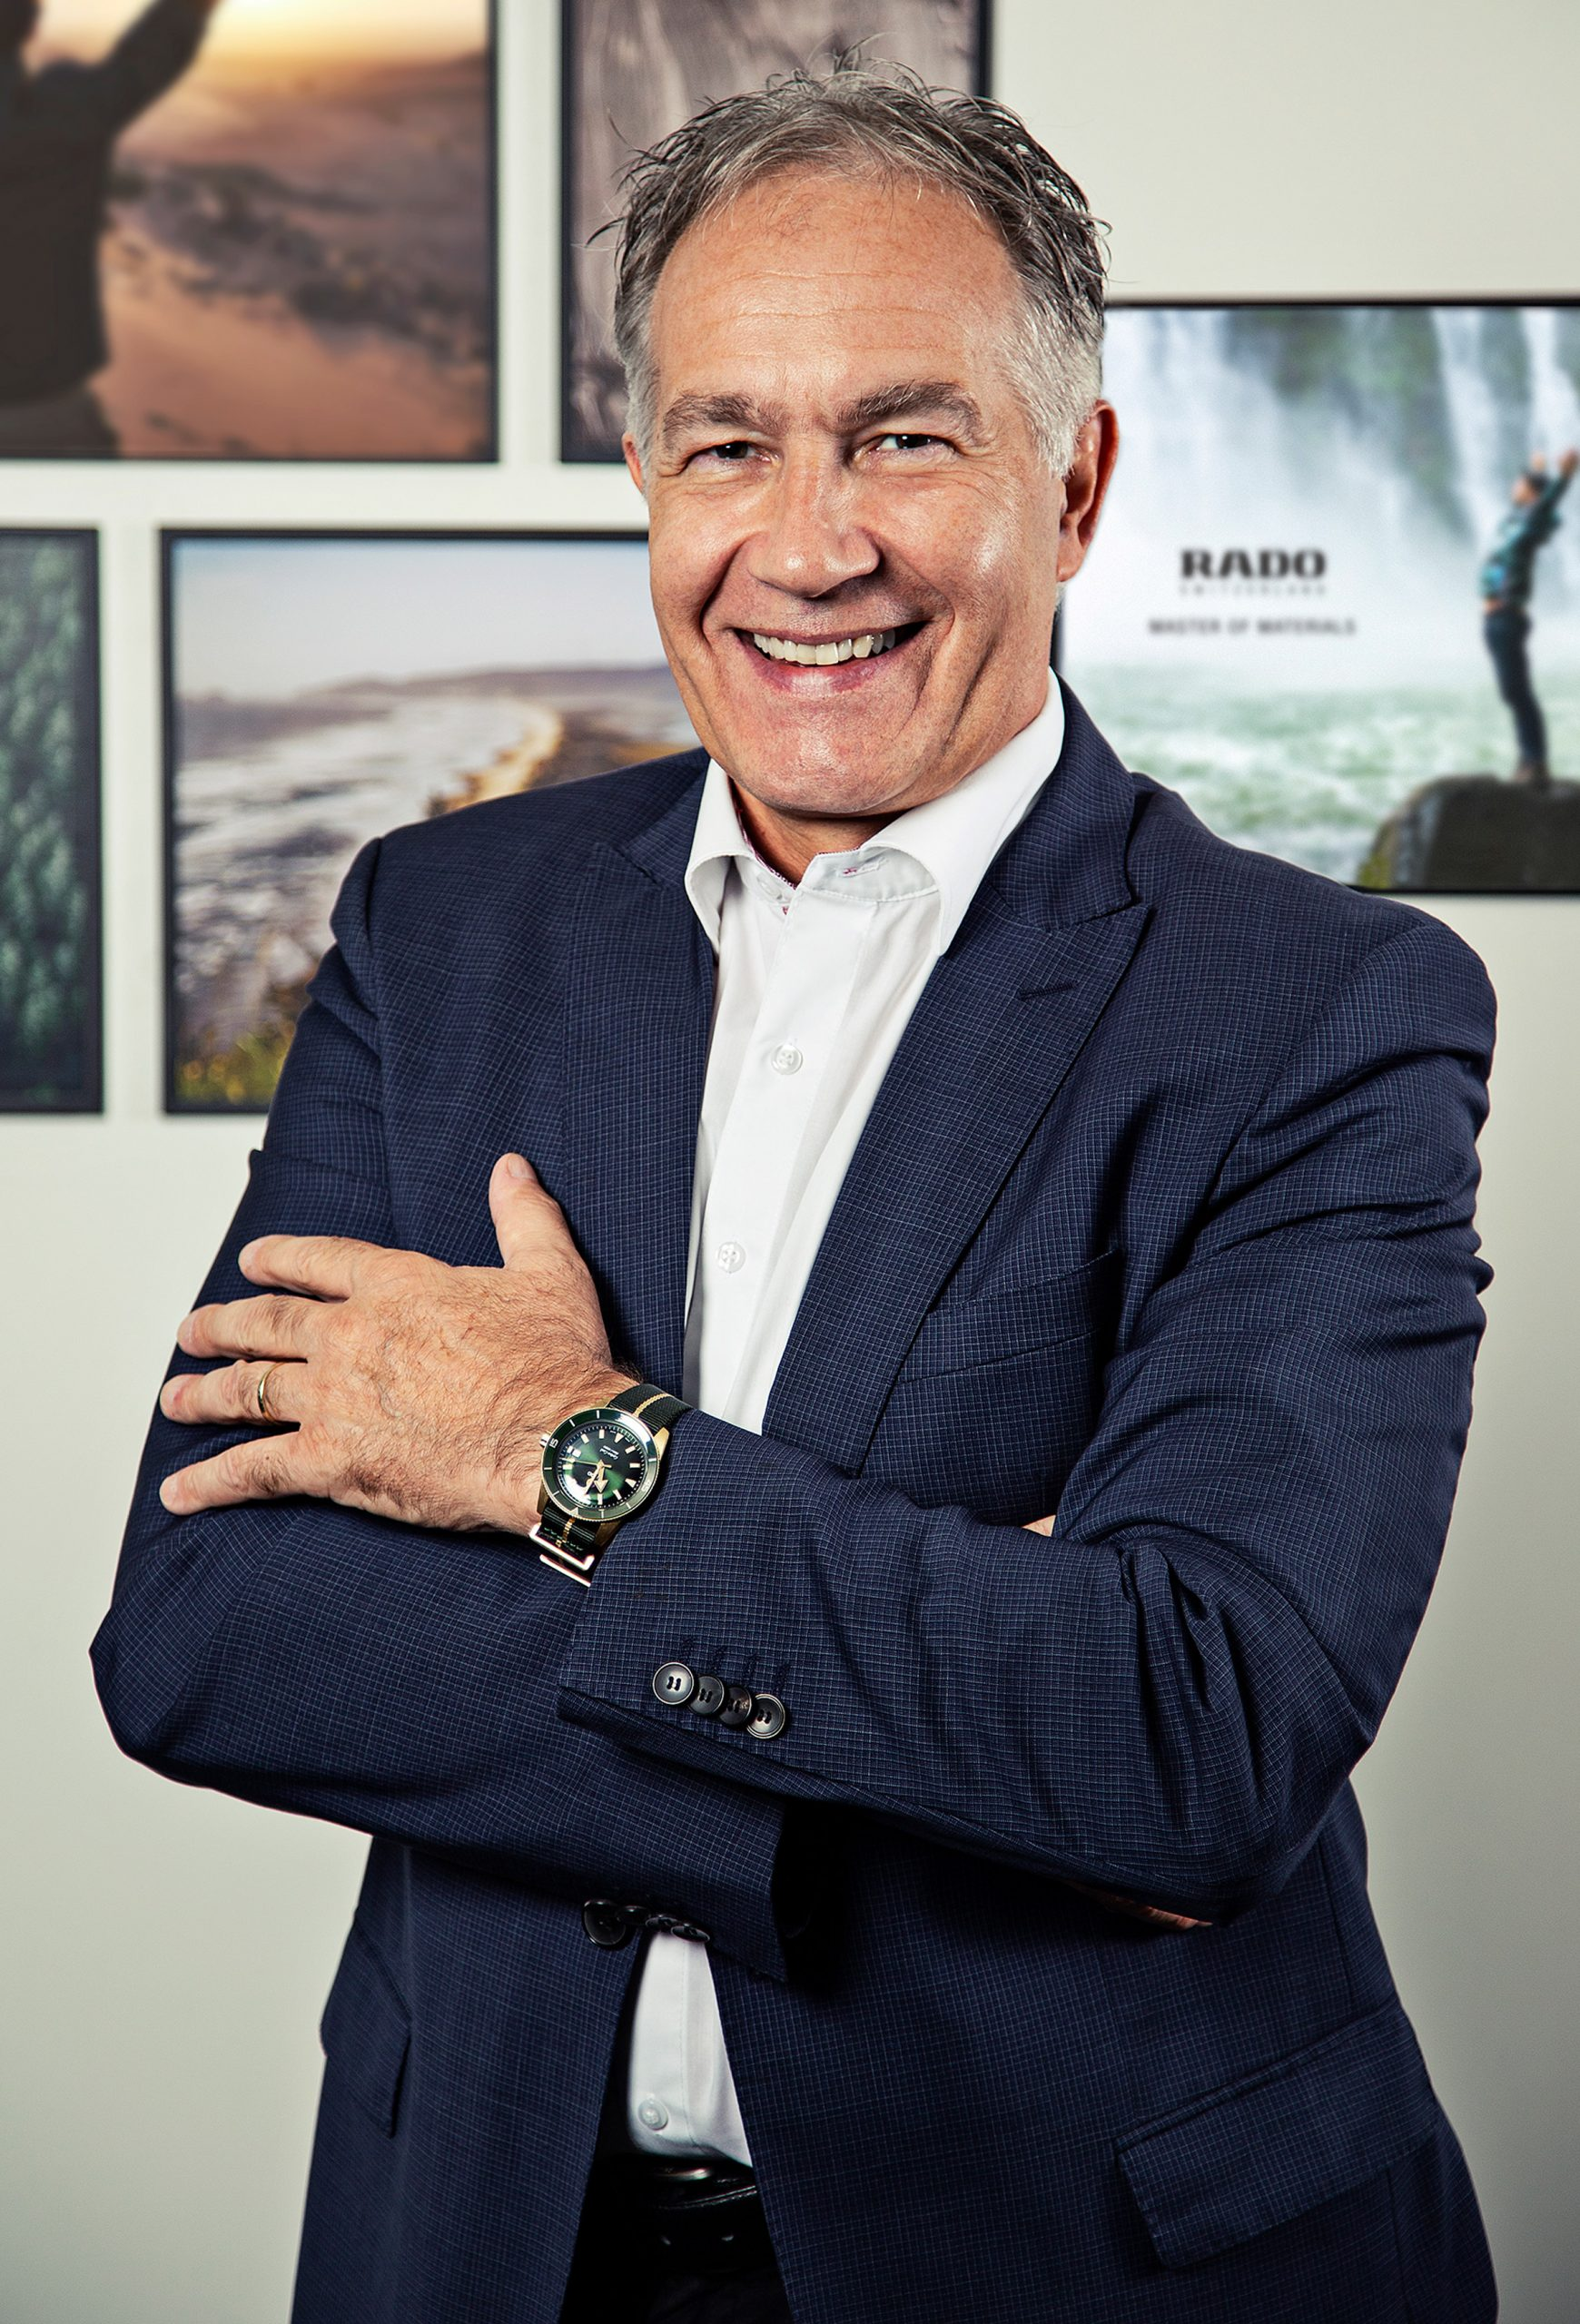 Adrian Bosshard, CEO of Rado